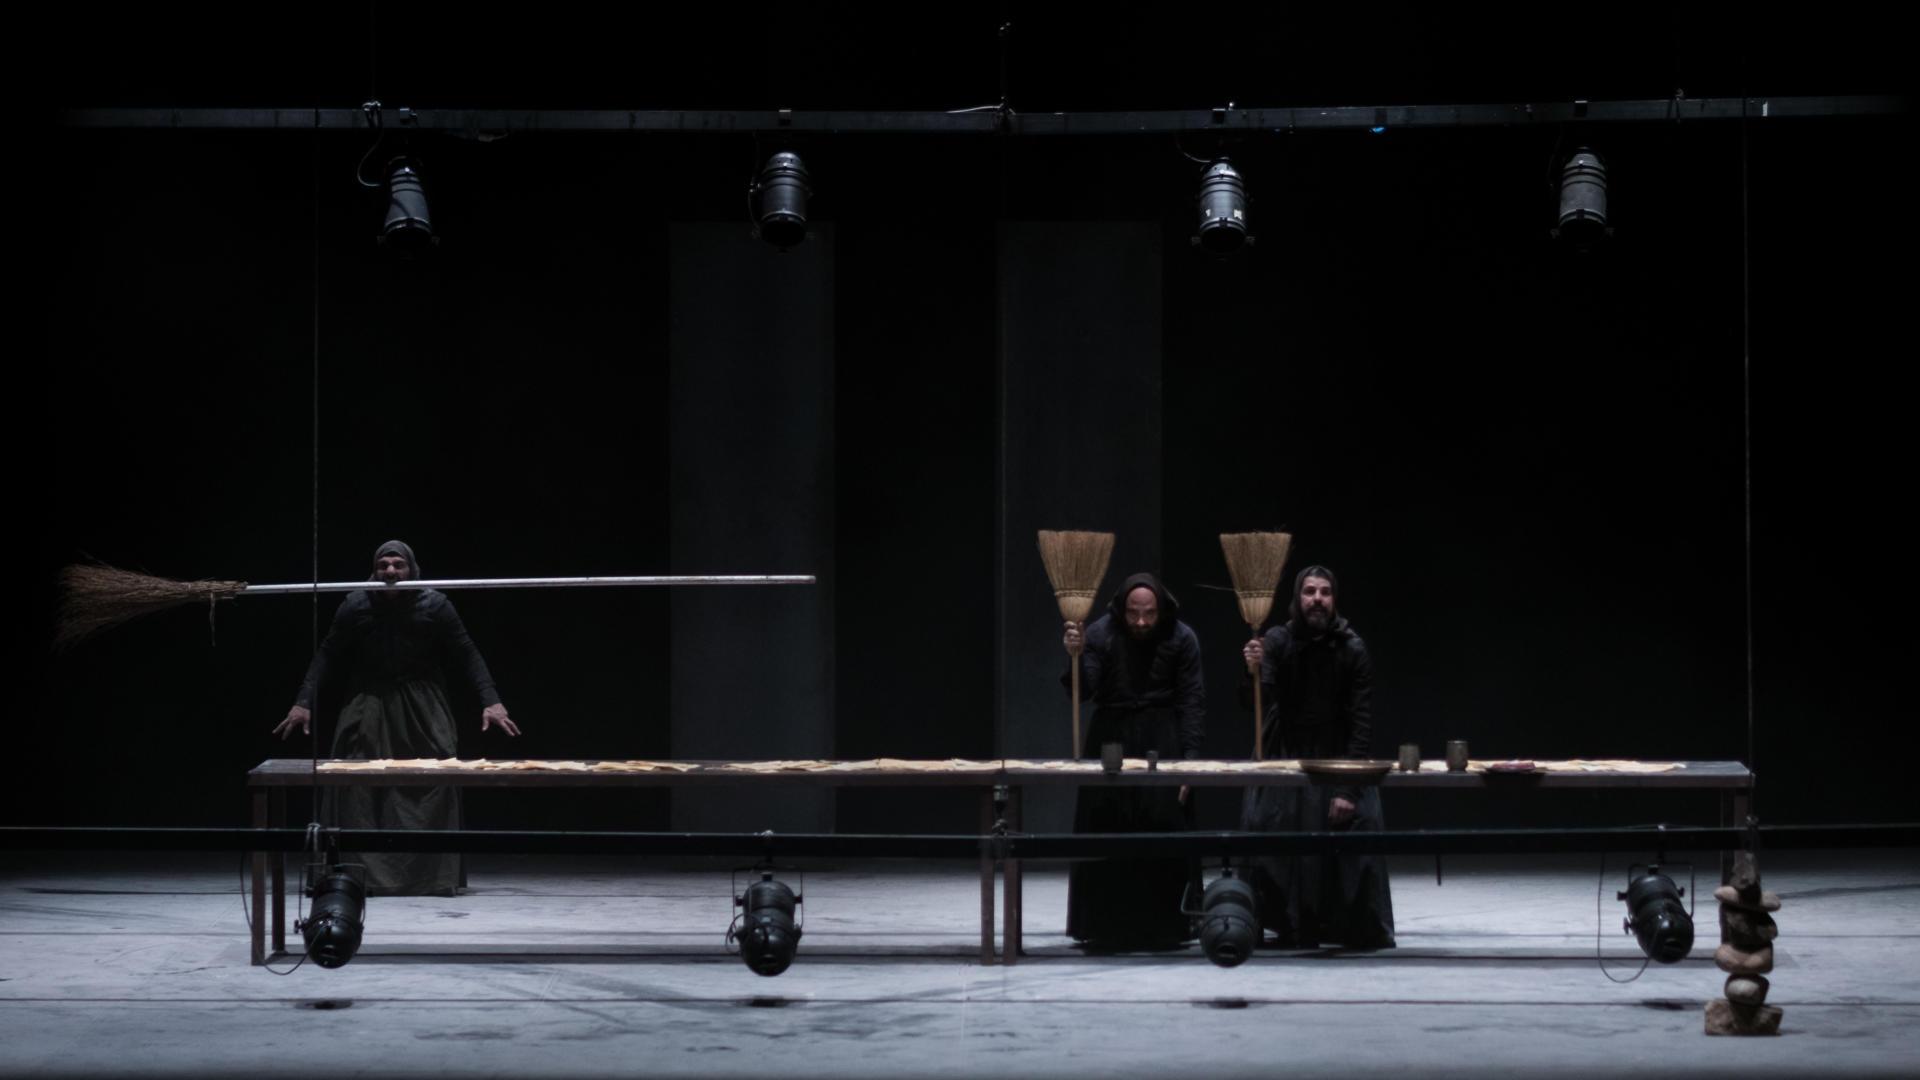 Alessandro Serra ens ha presentat un magnífic 'Macbeth' en sard a Temporada Alta